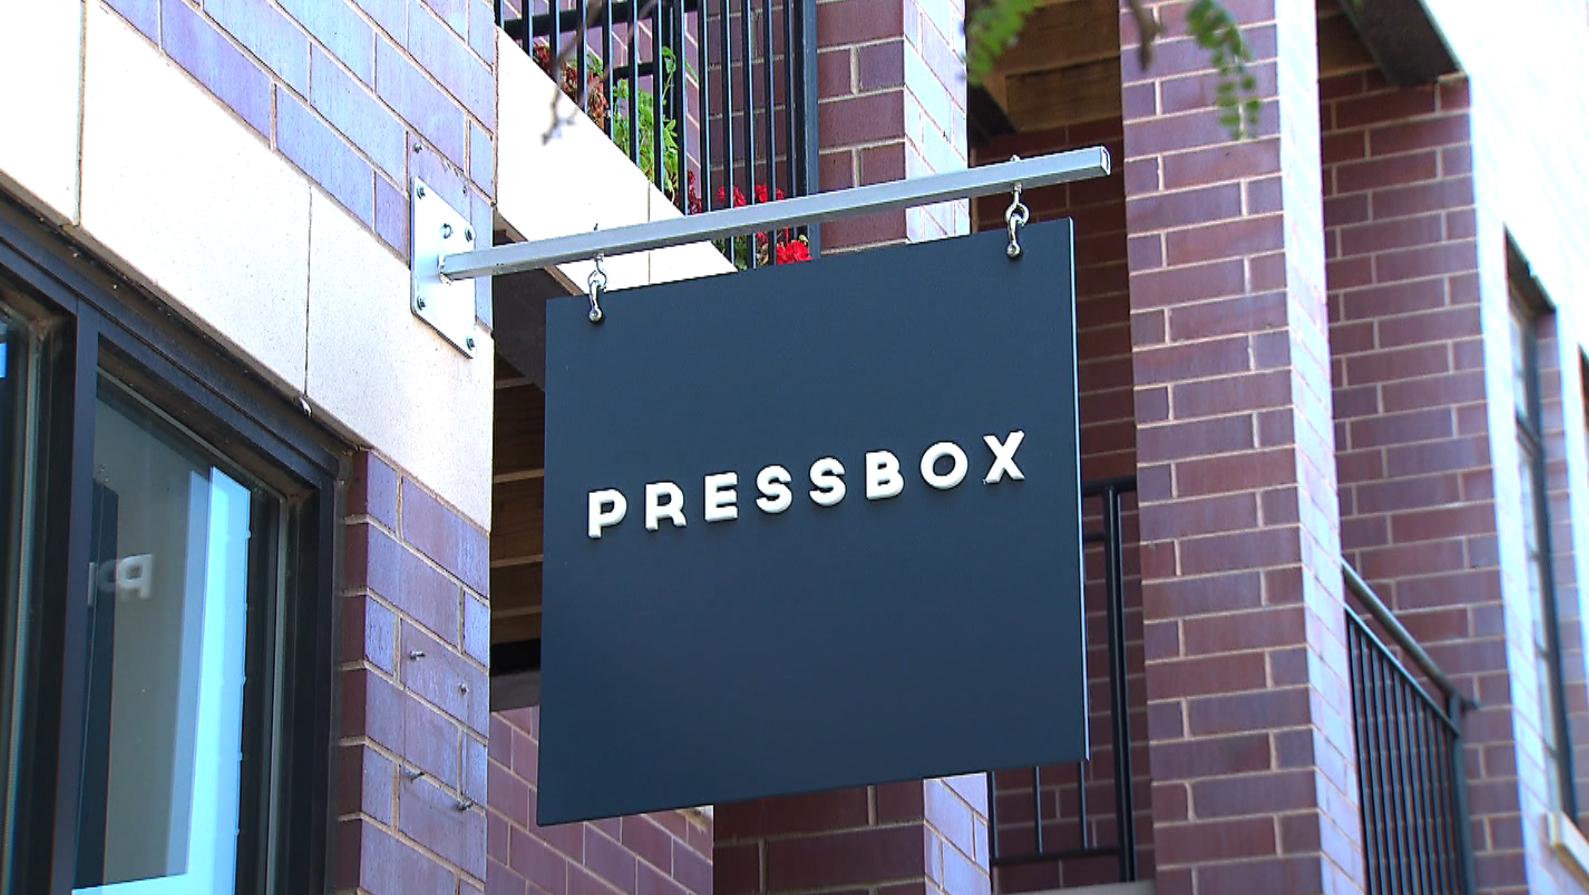 pressbox-sign.jpg